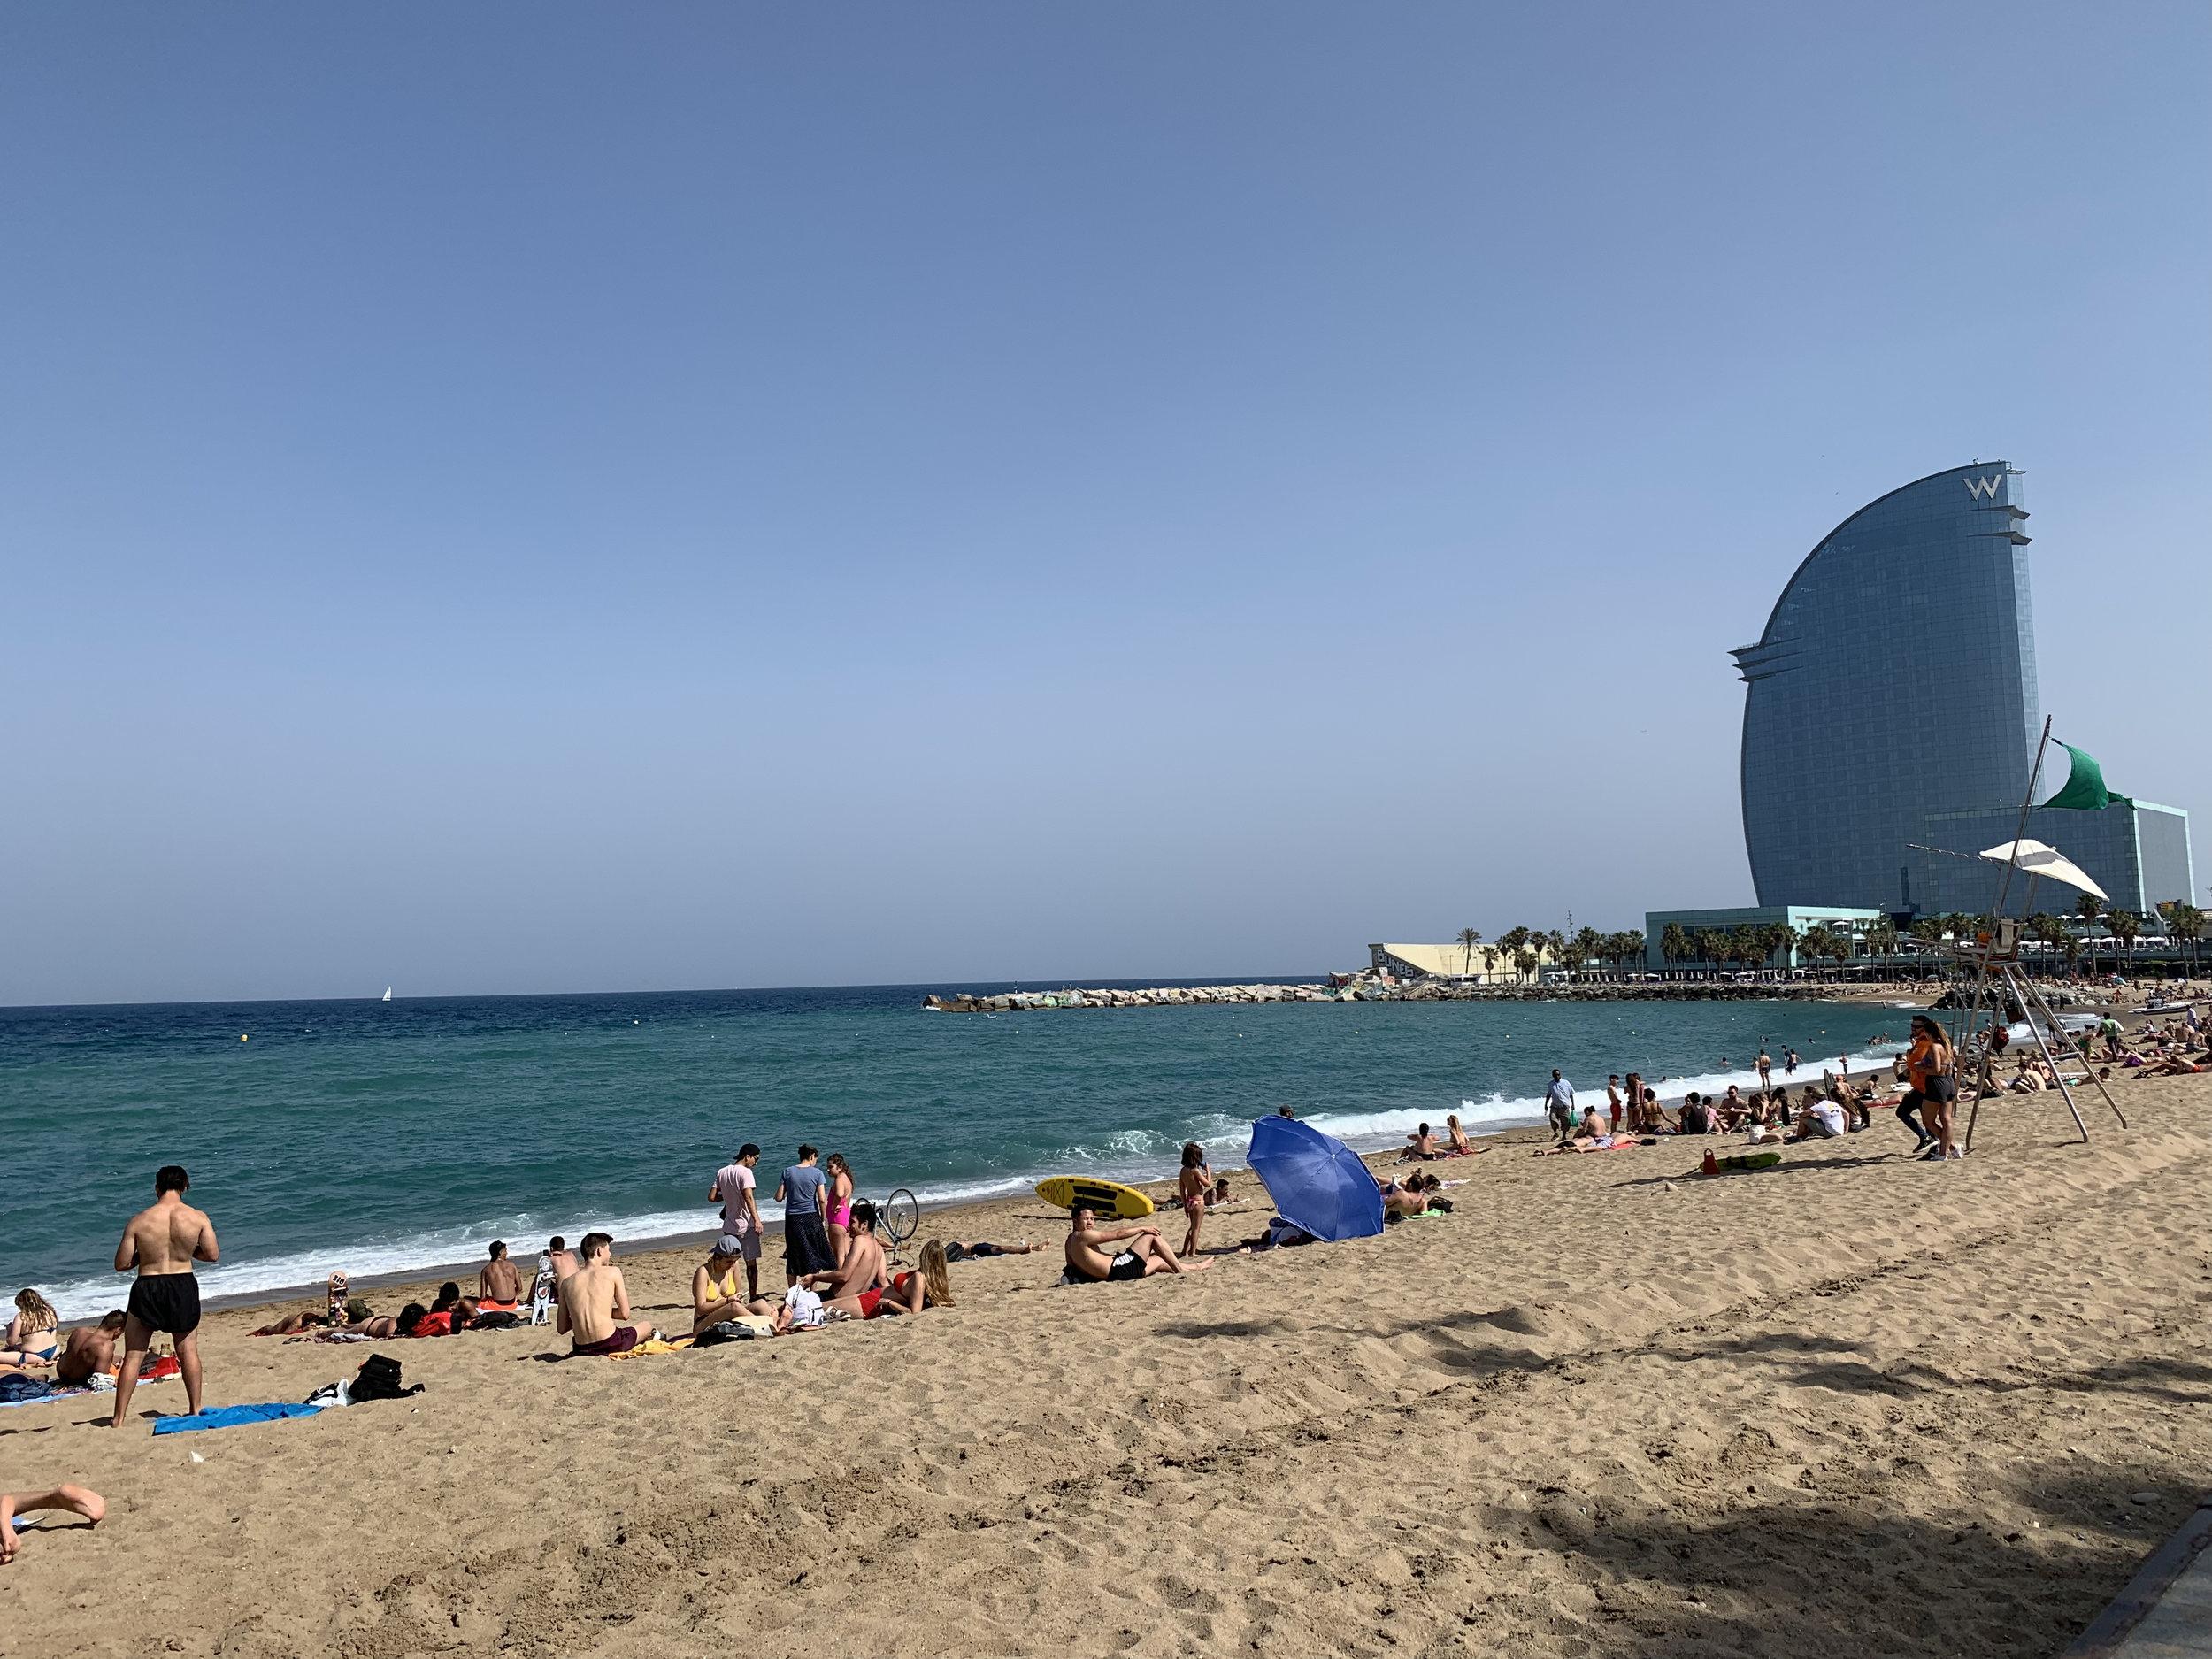 - Playa De La Barceloneta